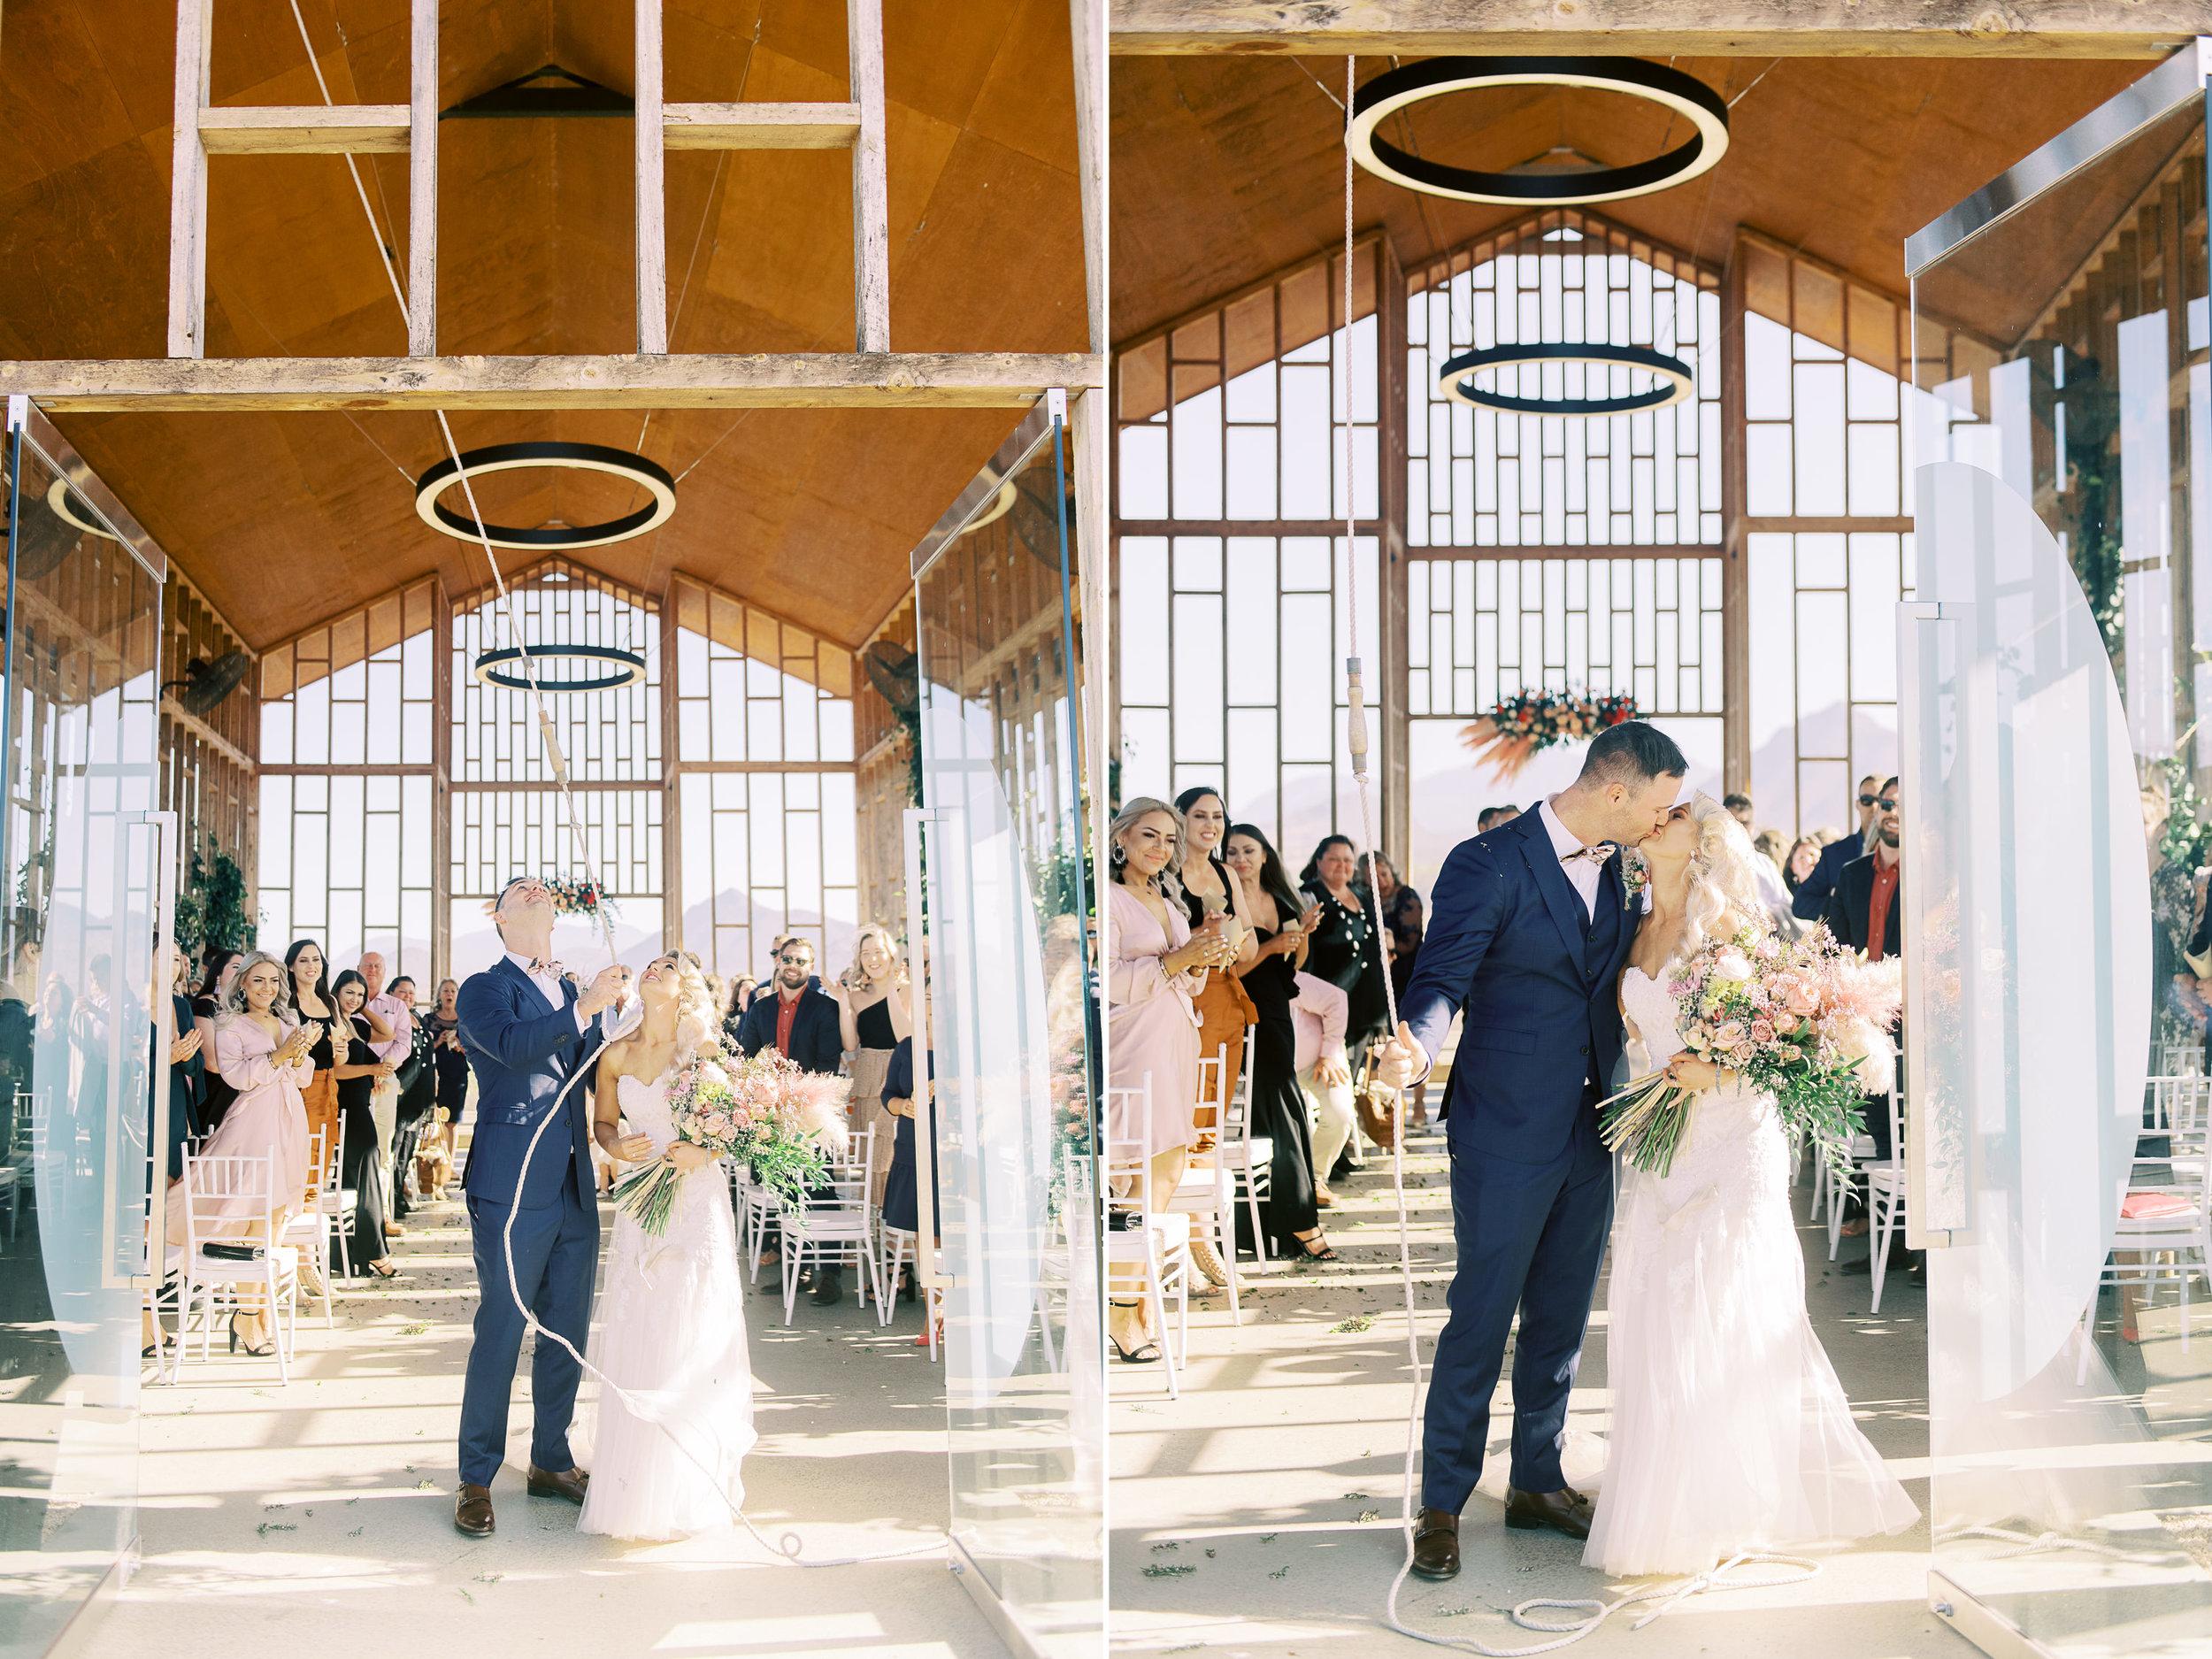 kooroomba-lavendar-farm-film-photography-wedding-photography-romantic-15.jpg